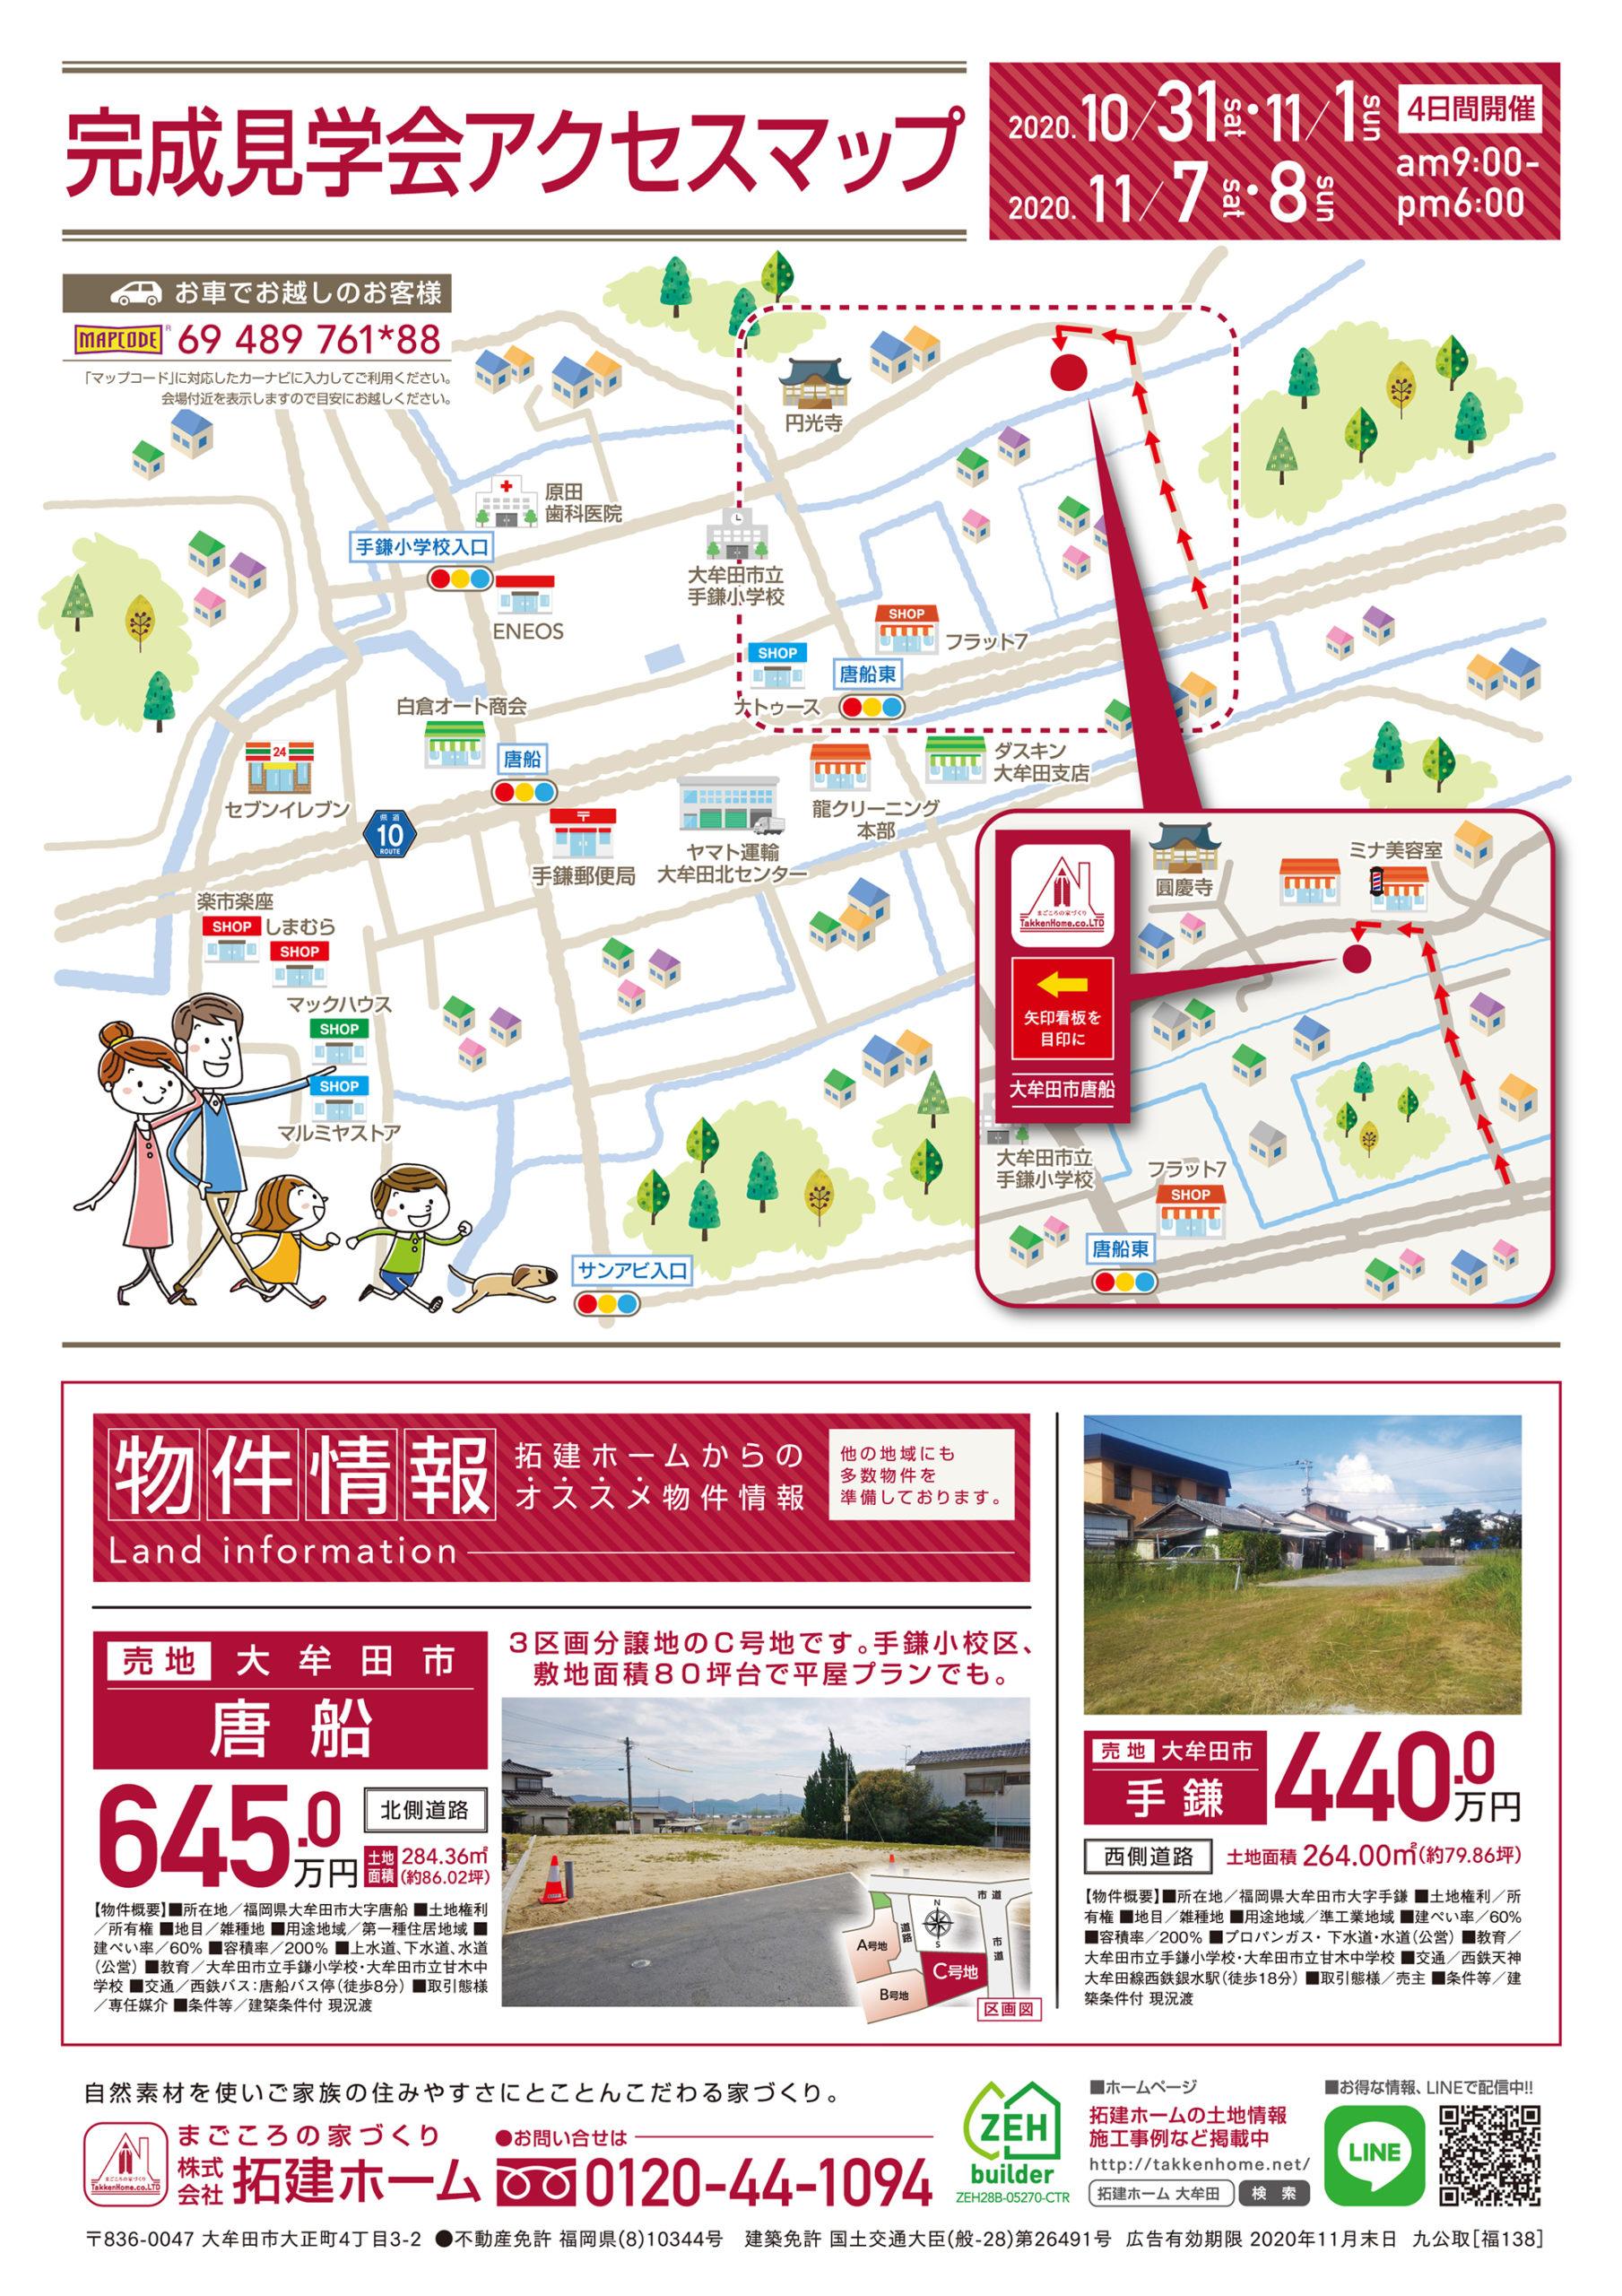 大牟田市で住宅の完成見学会